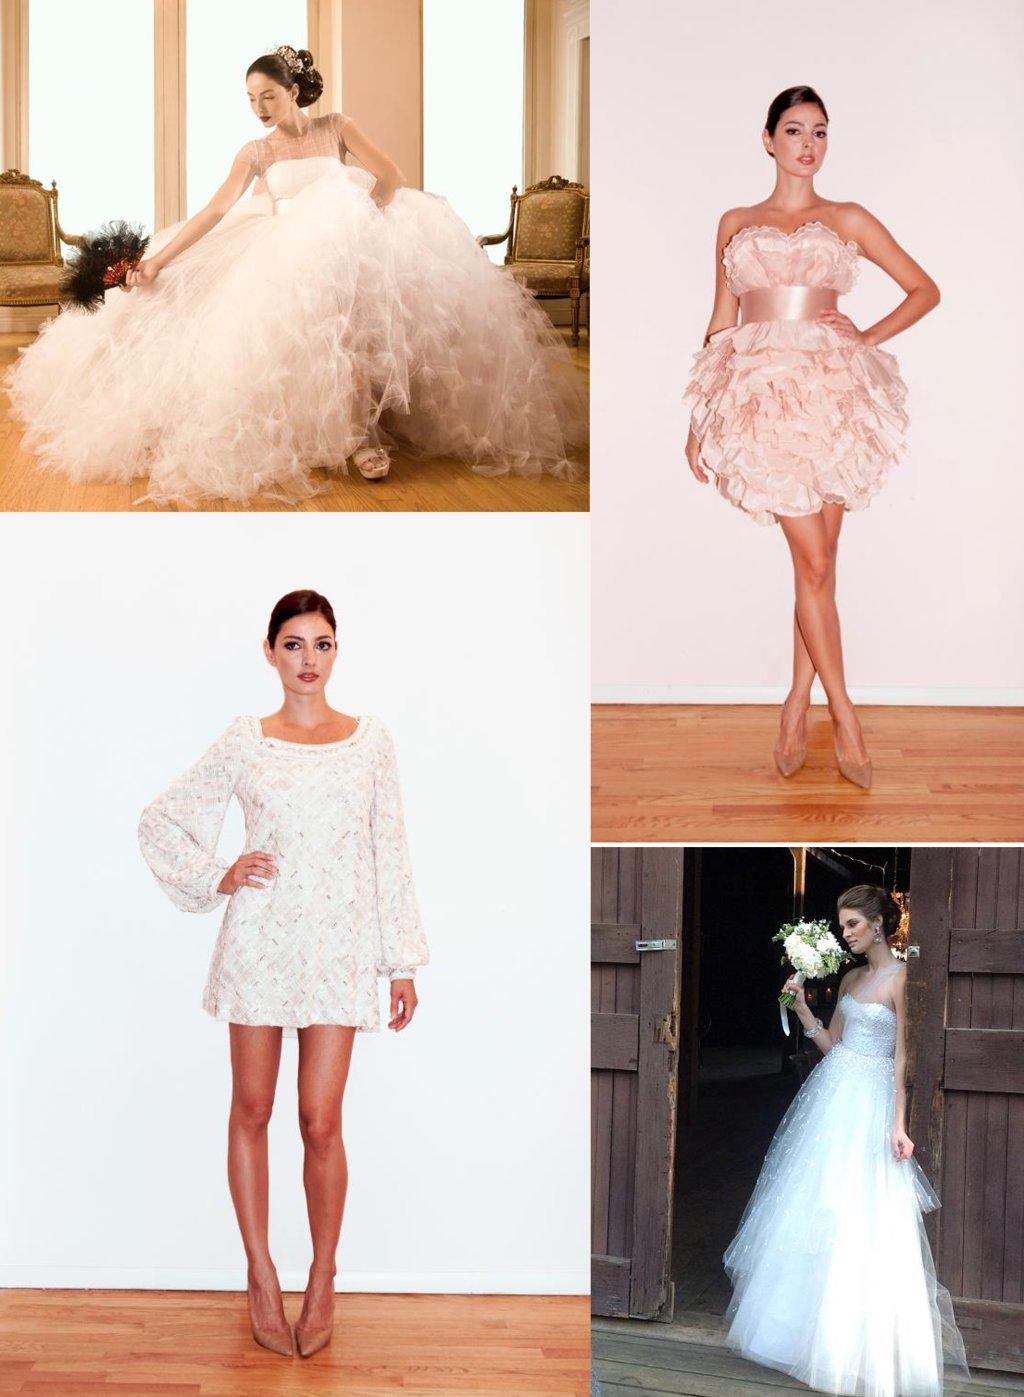 Randi-rahm-wedding-dresses-the-bachelorette-wedding-ashley-hebert.full